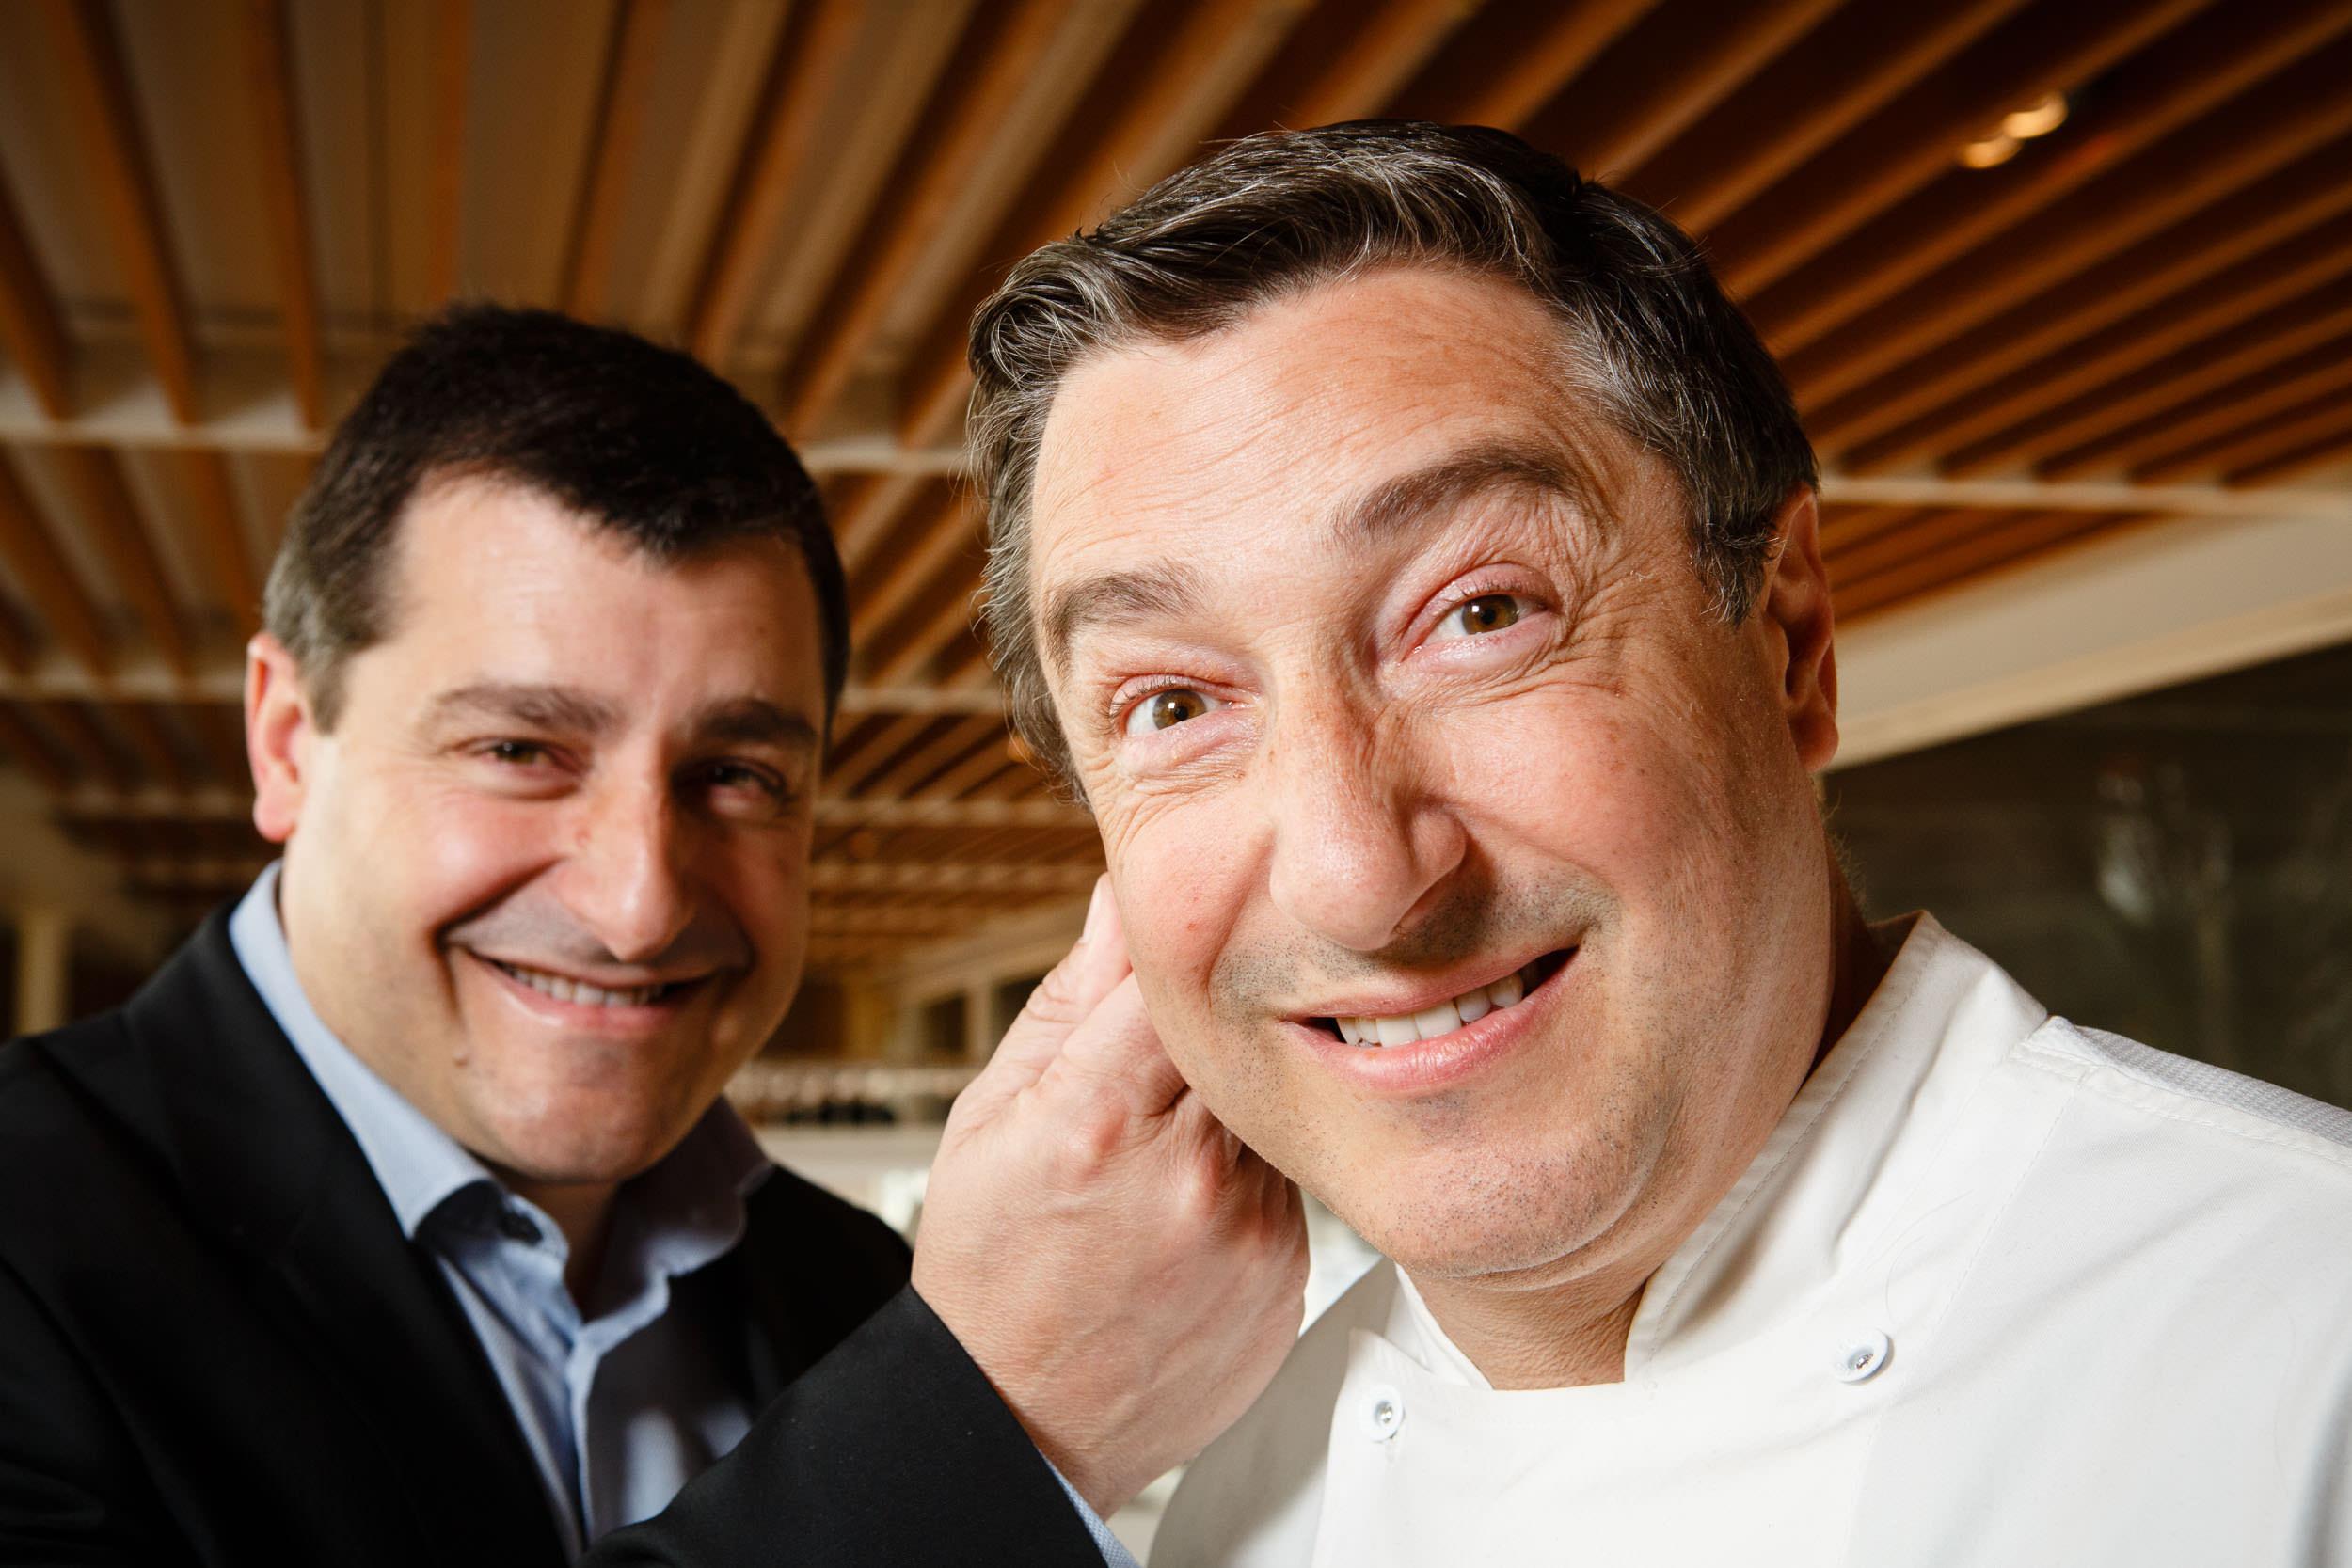 14/3/14 Brothers Josep (left) and Joan (right) Roca, El Cellar de Can Roca restaurant, Girona, Spain. Photo by James Sturcke   www.sturcke.org